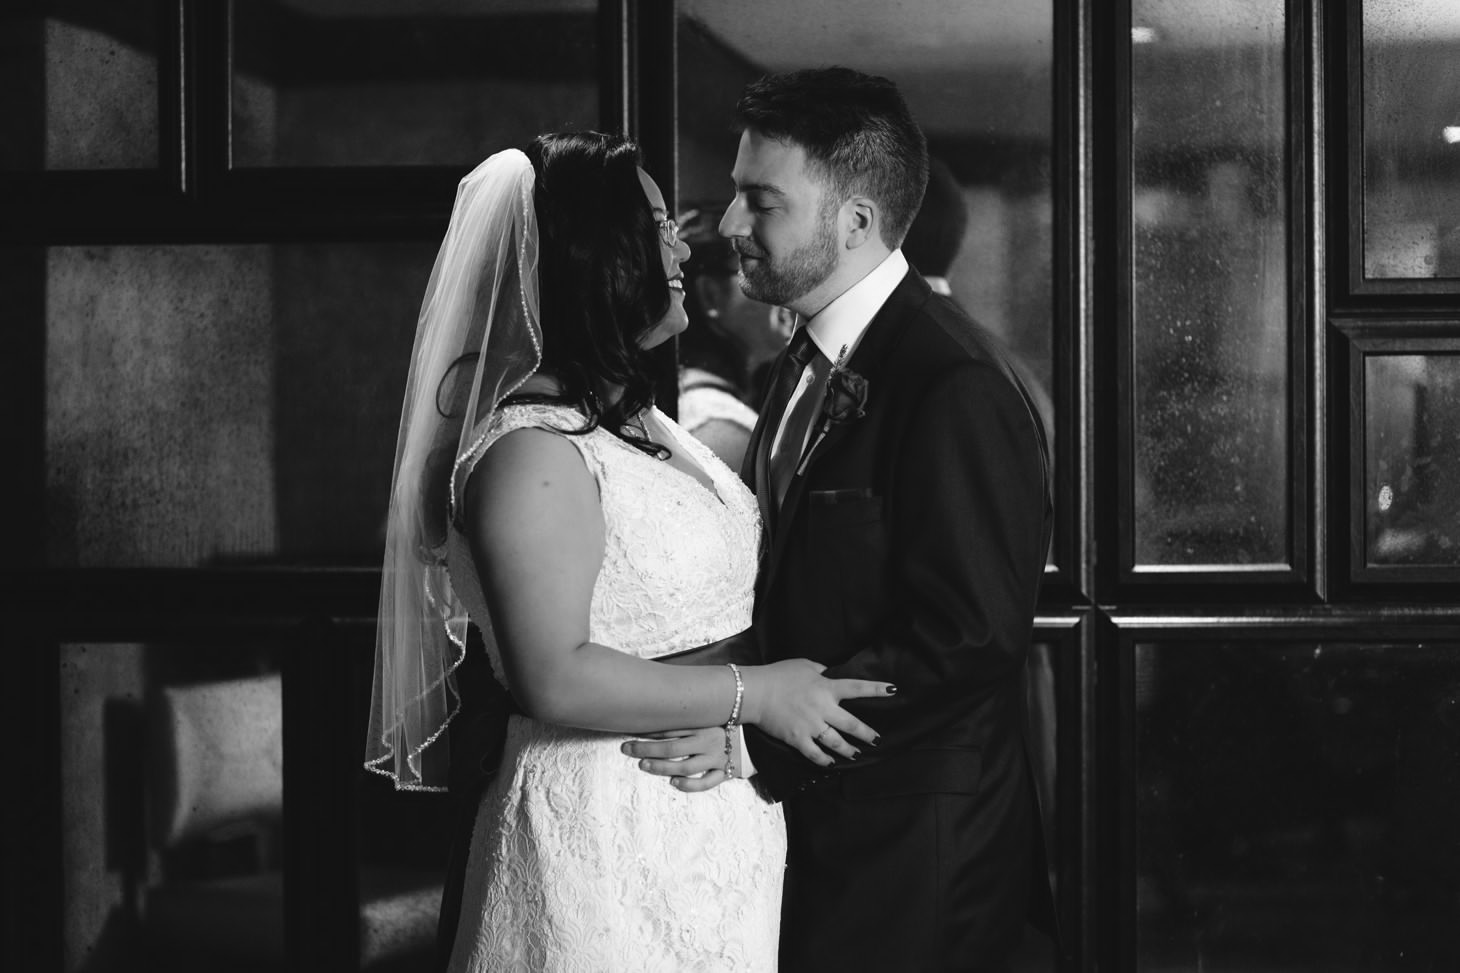 001-nyc-wedding-portrait-photographer-times-square-muse-hotel-winter-wedding-smitten-chickens.jpg